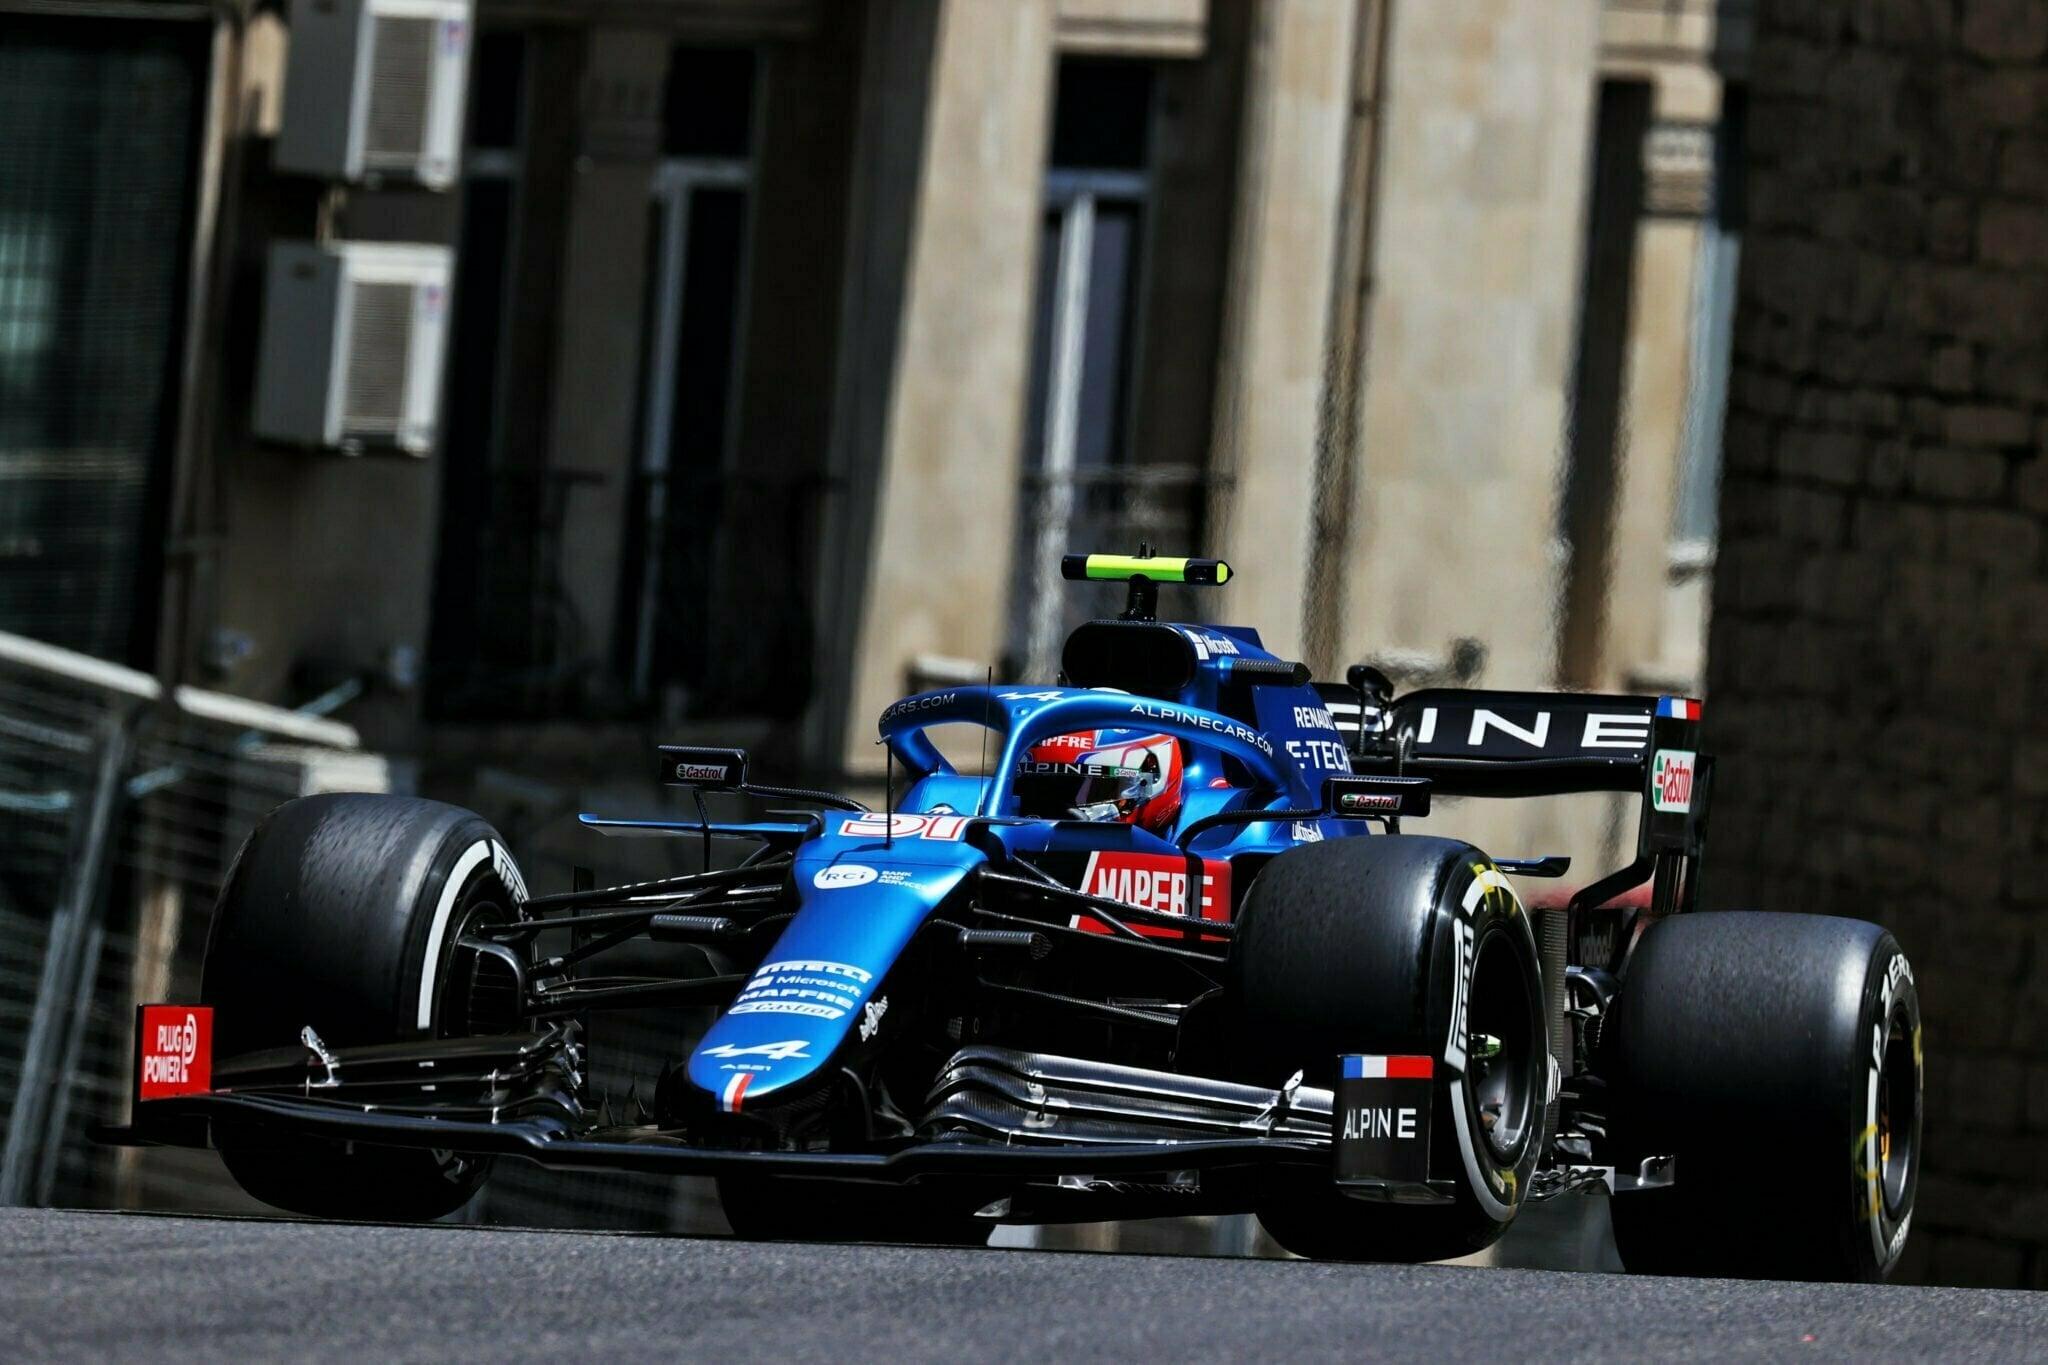 Alpine F1 Azerbaijan Grand Prix Baku Alonso Ocon 202